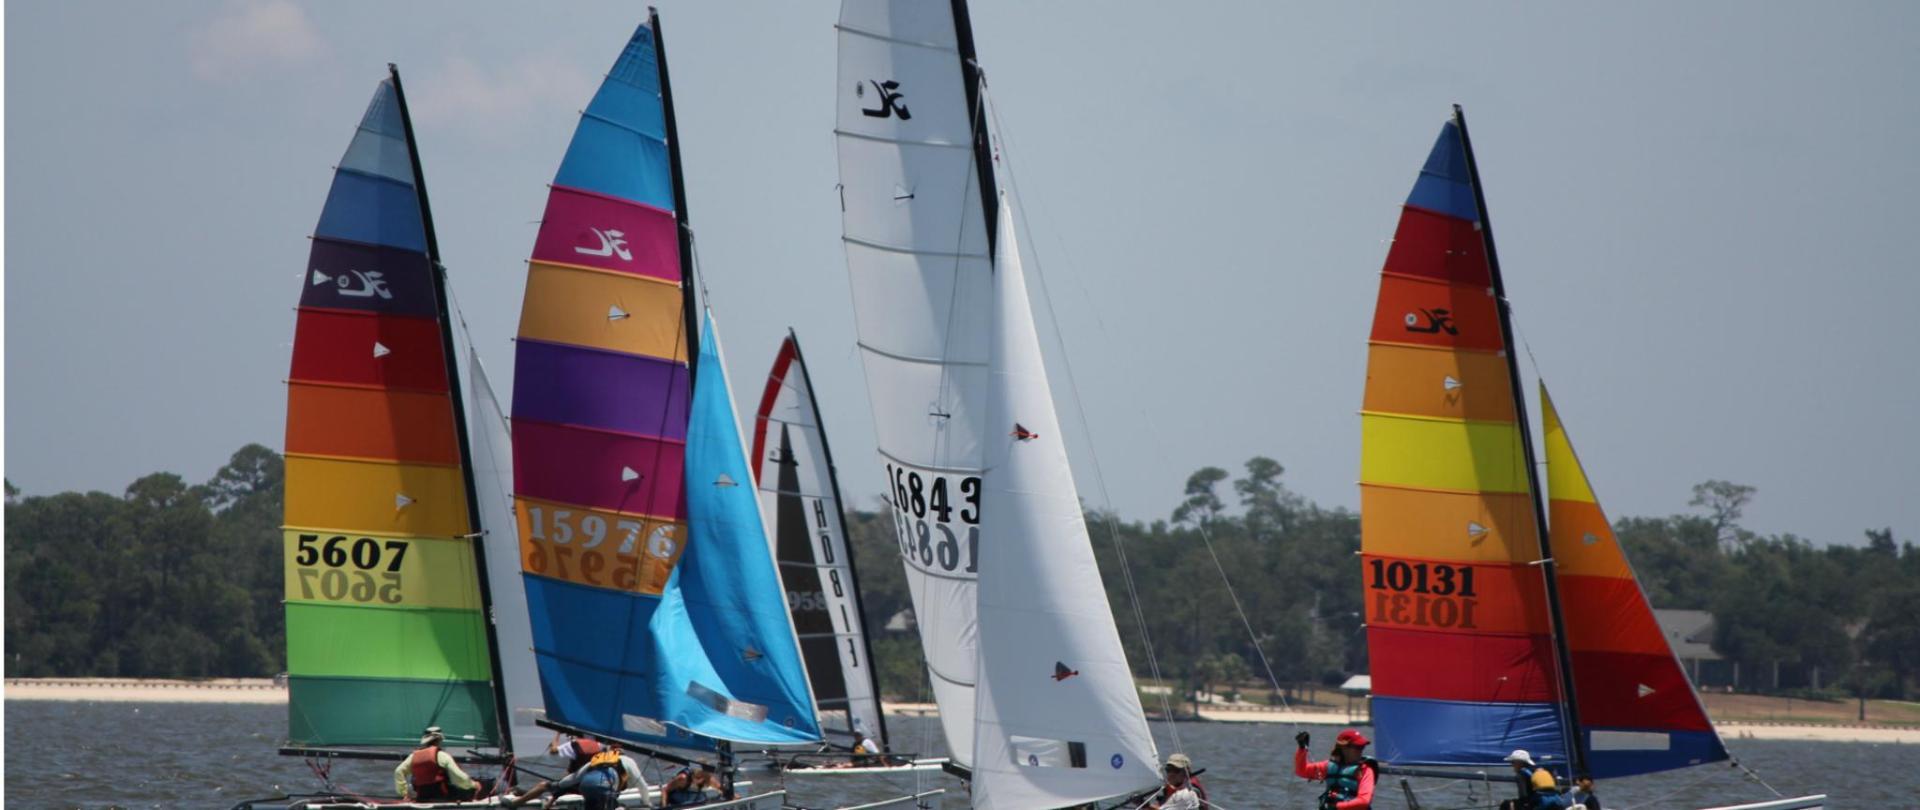 sails1920.jpg